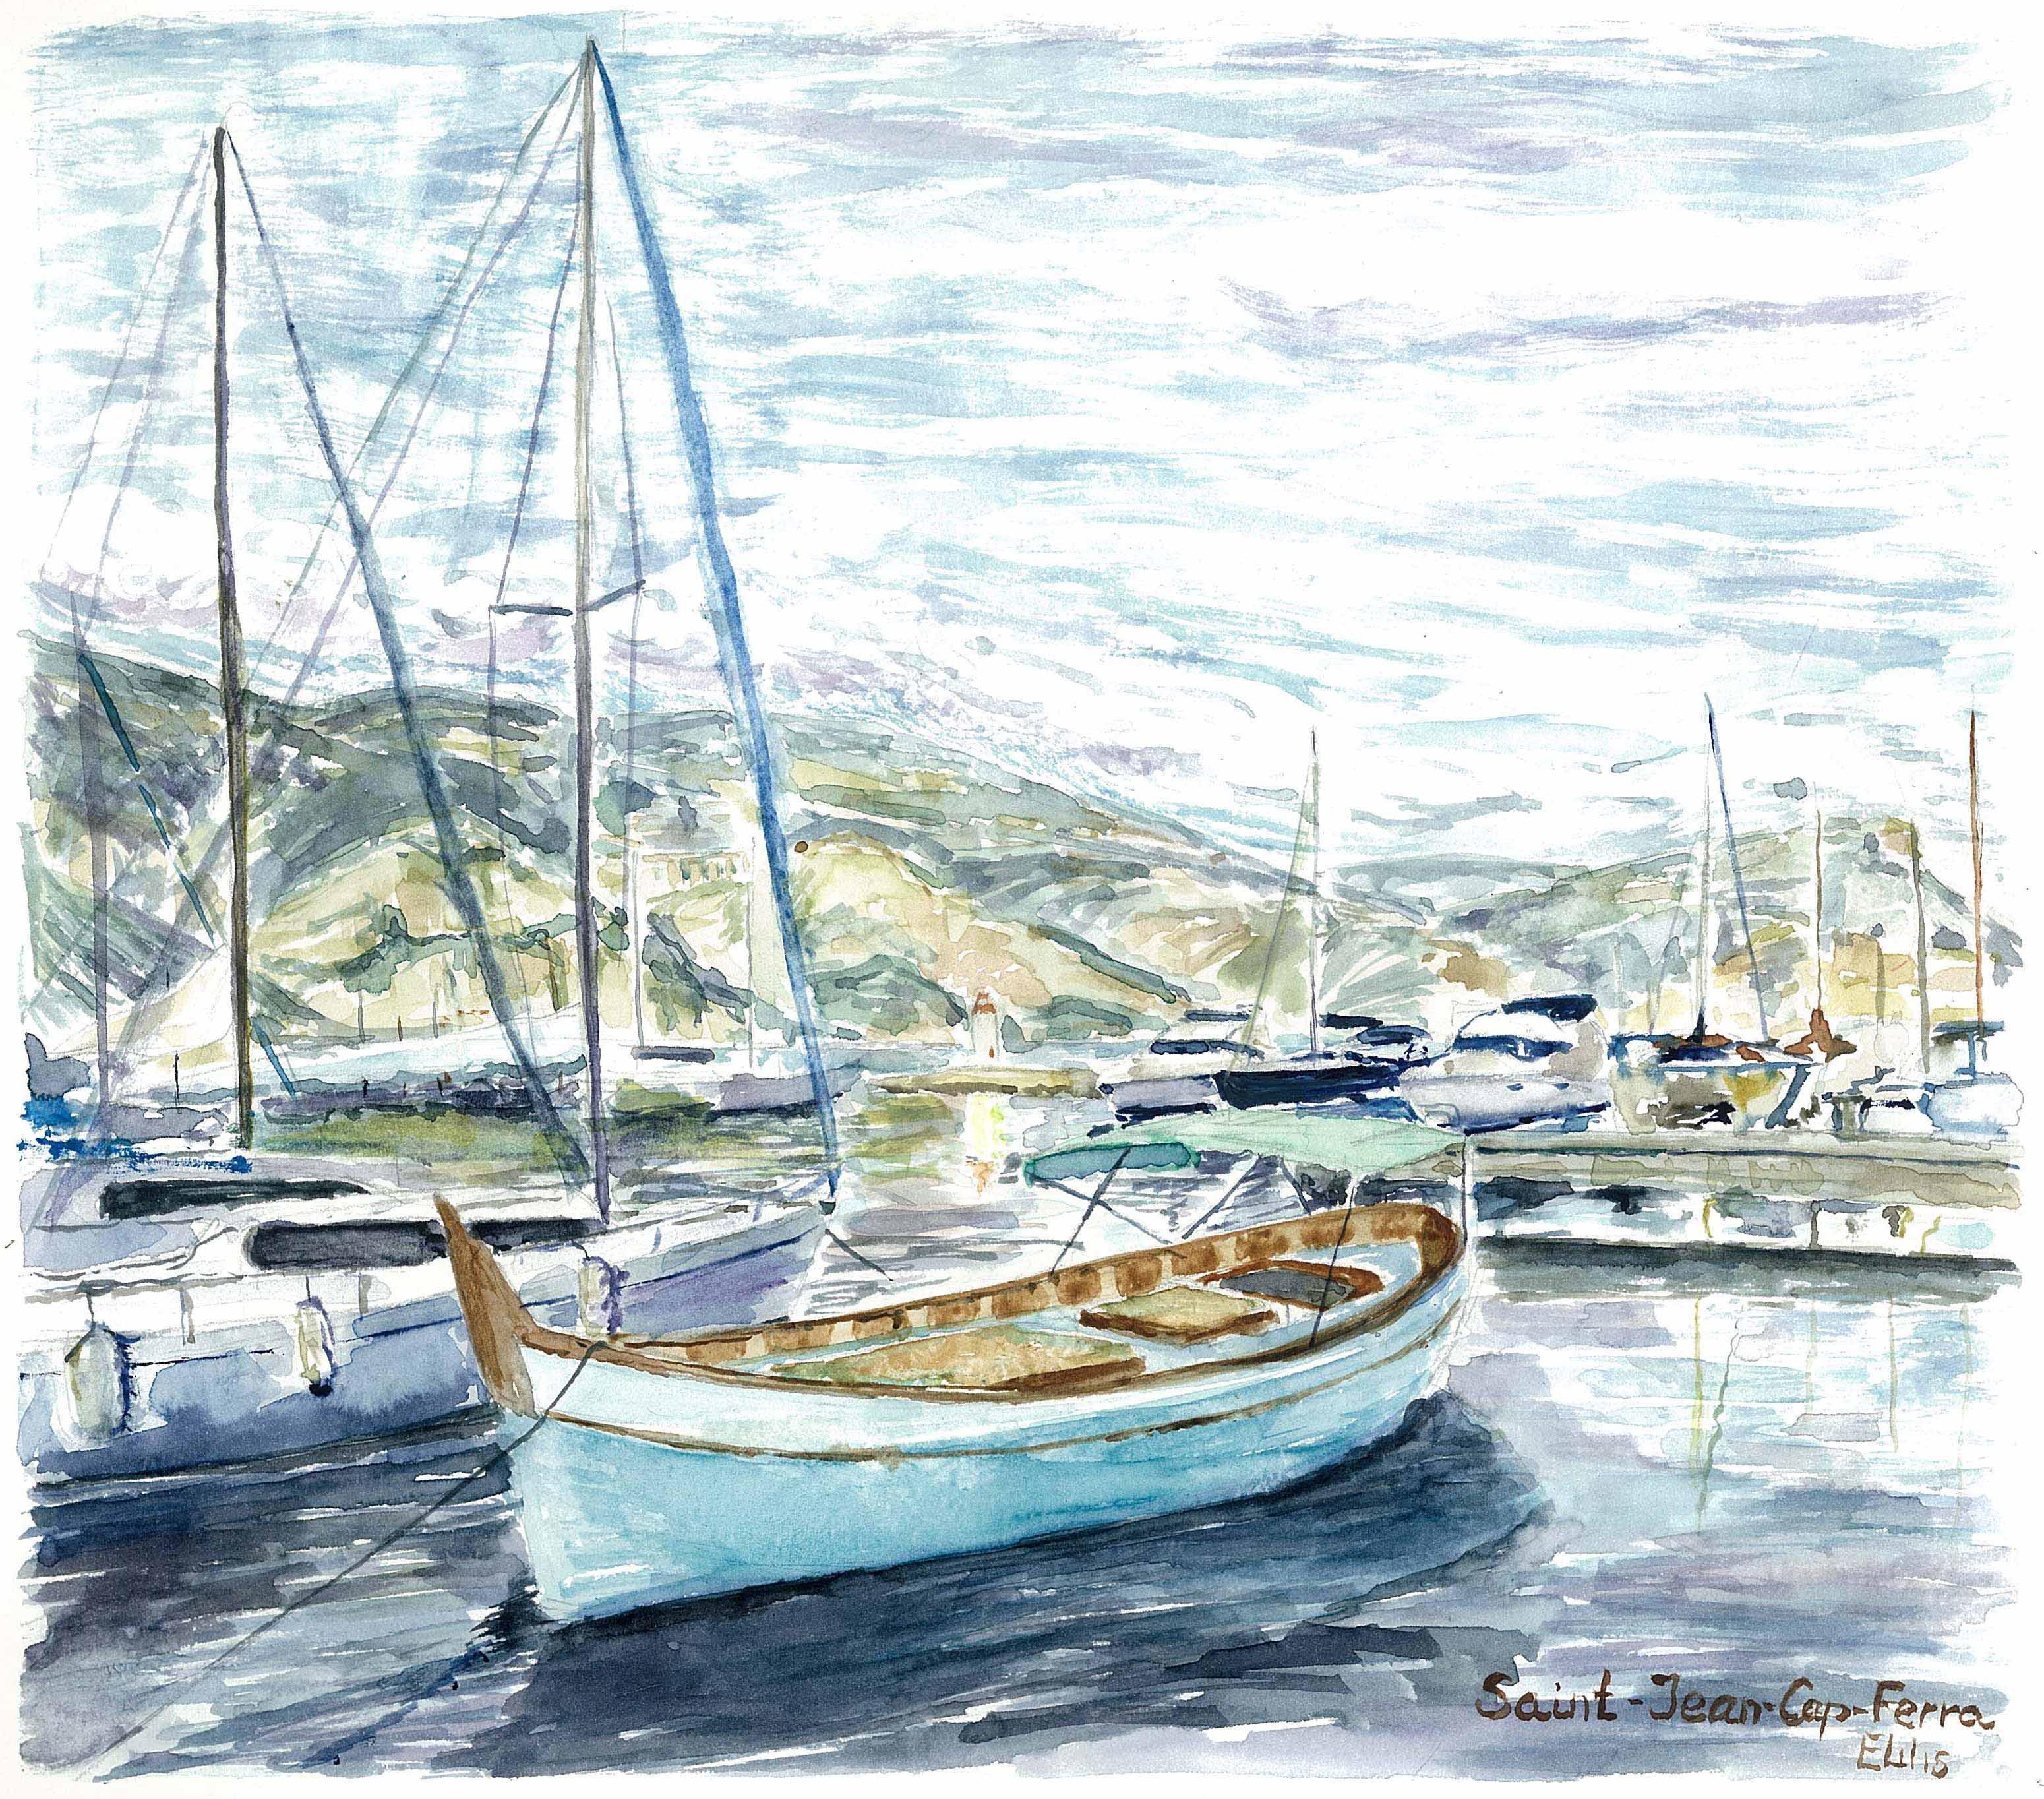 The port of Saint-Jean-Cap-Ferrat